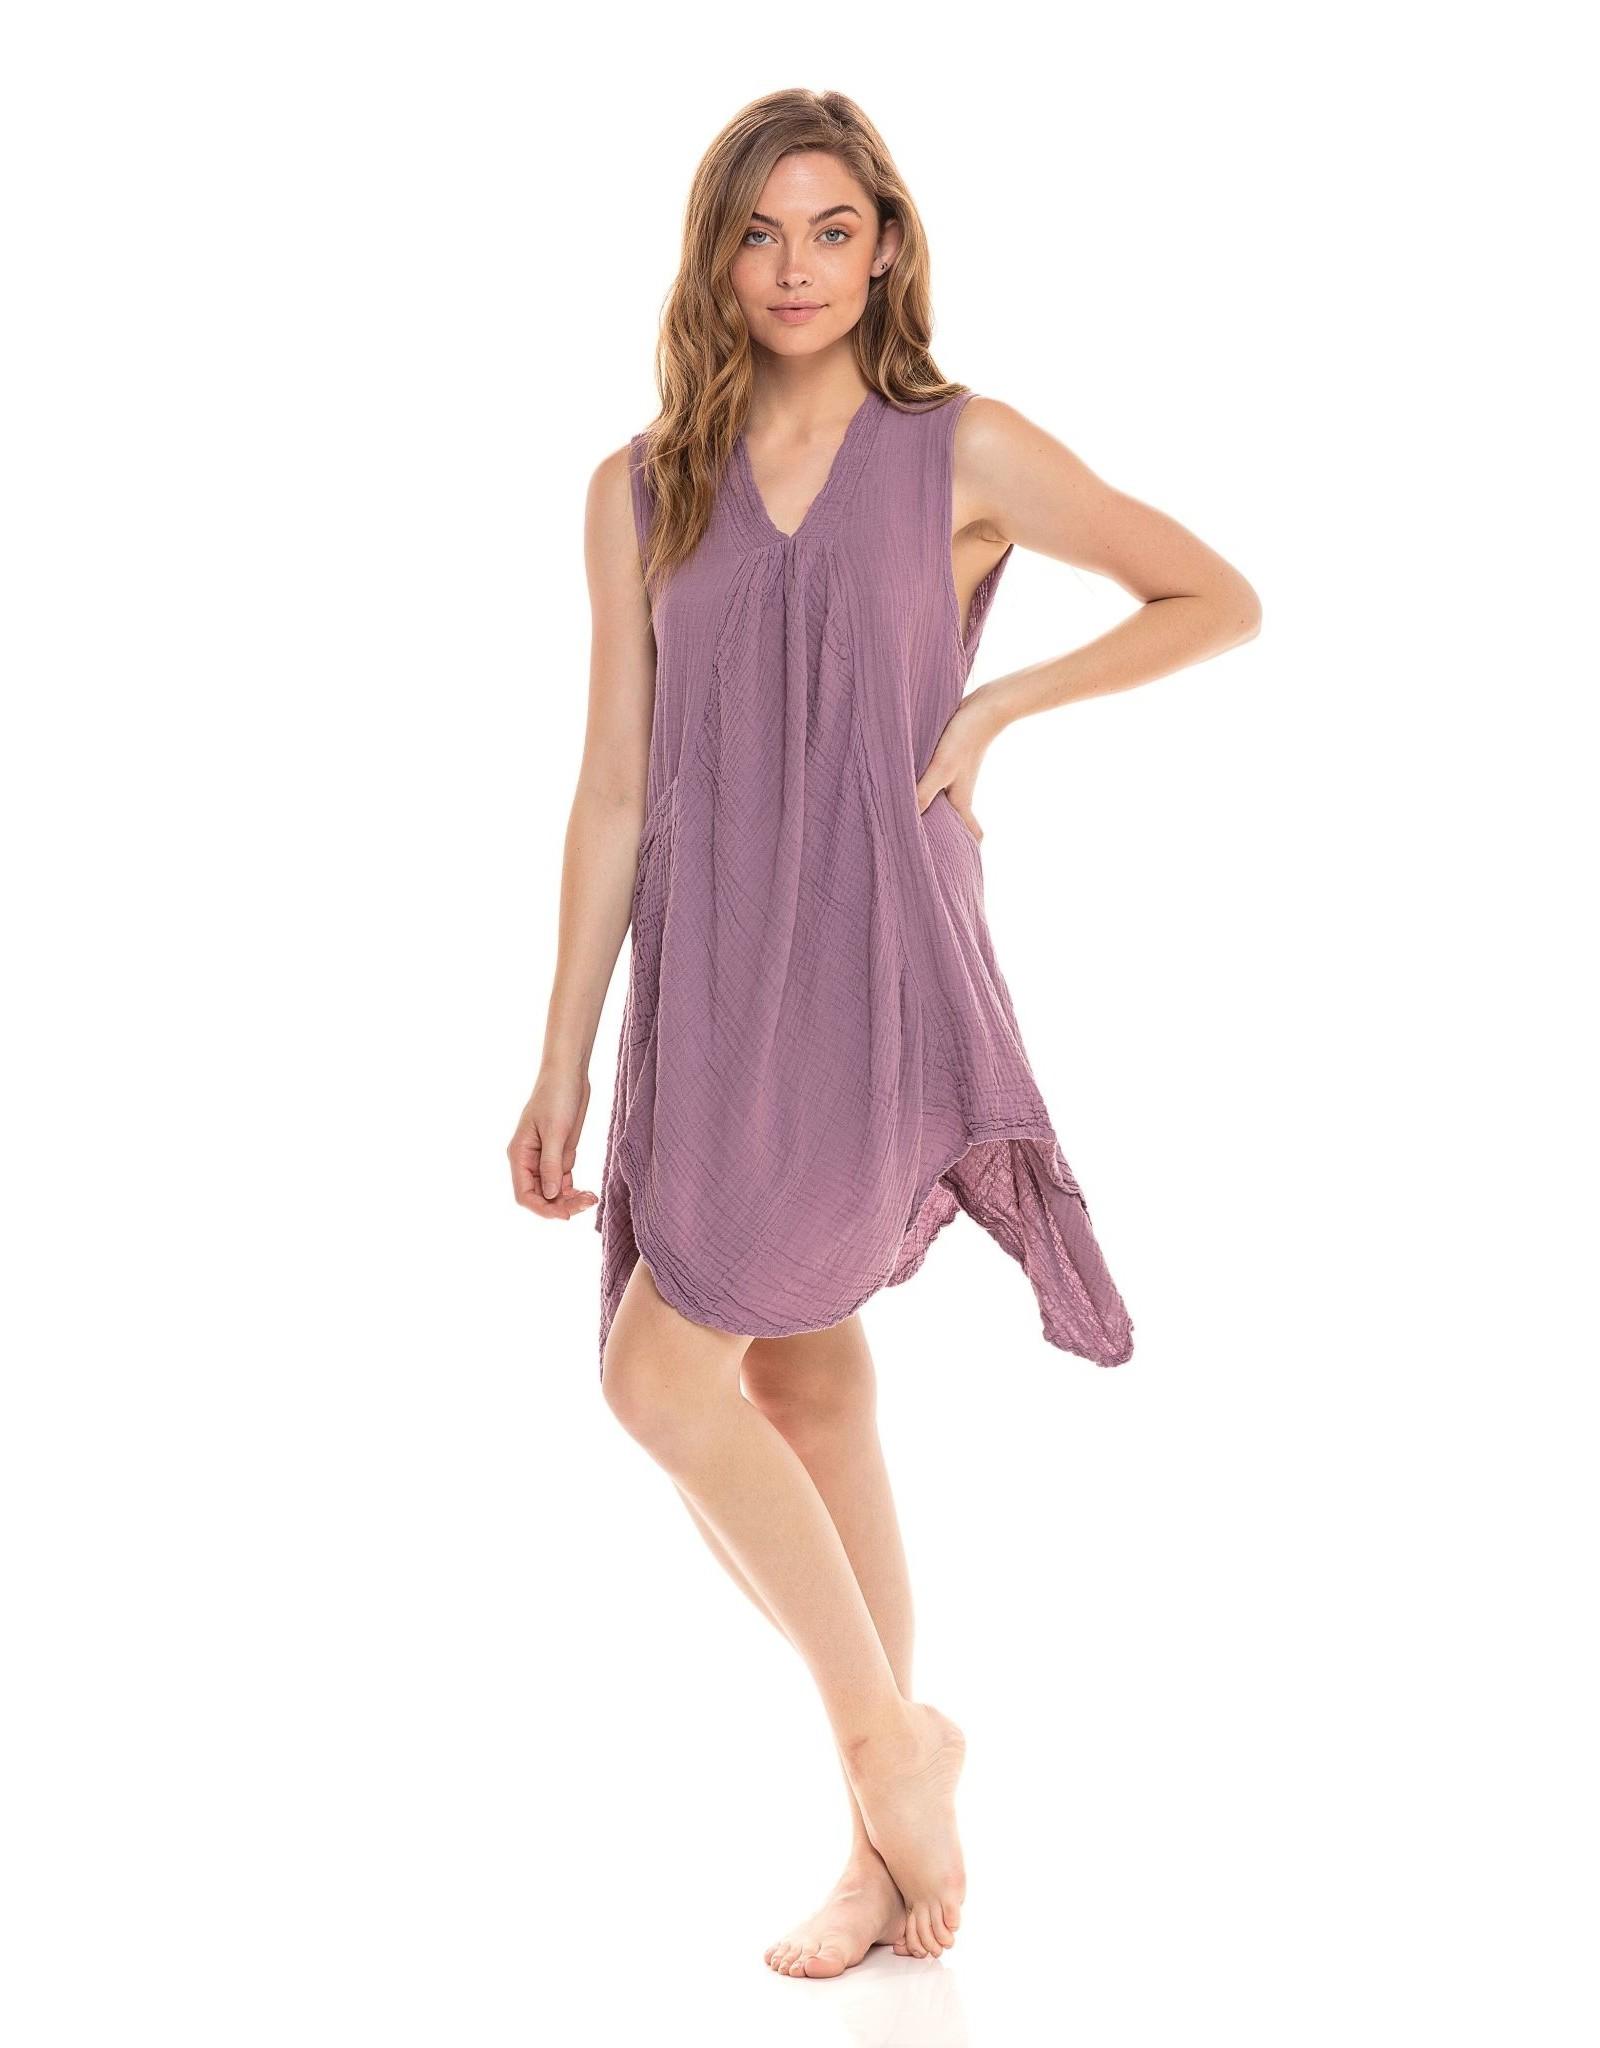 Pippy Cotton Tank Dress Lavender L/XL, Thailand